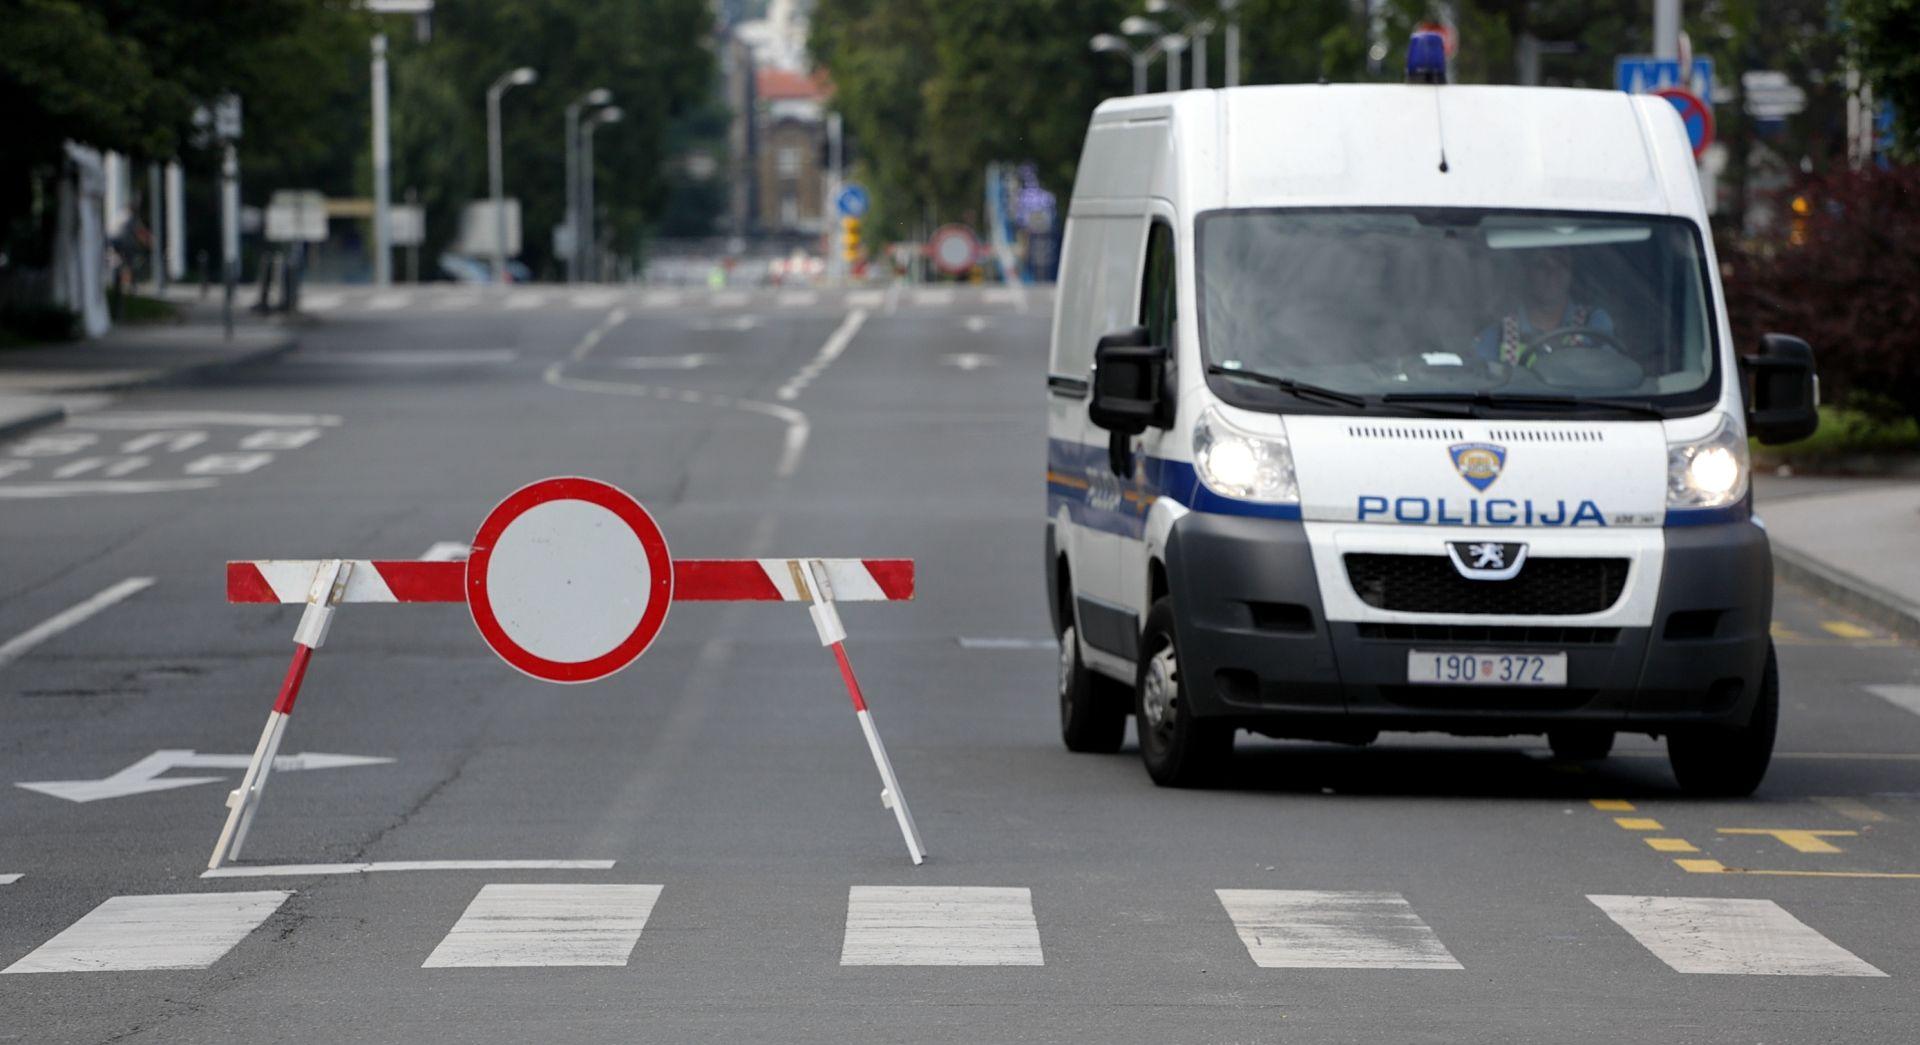 SLUŽBENI POSJET: Posebna regulacija prometa zbog dolaska turskog predsjednika